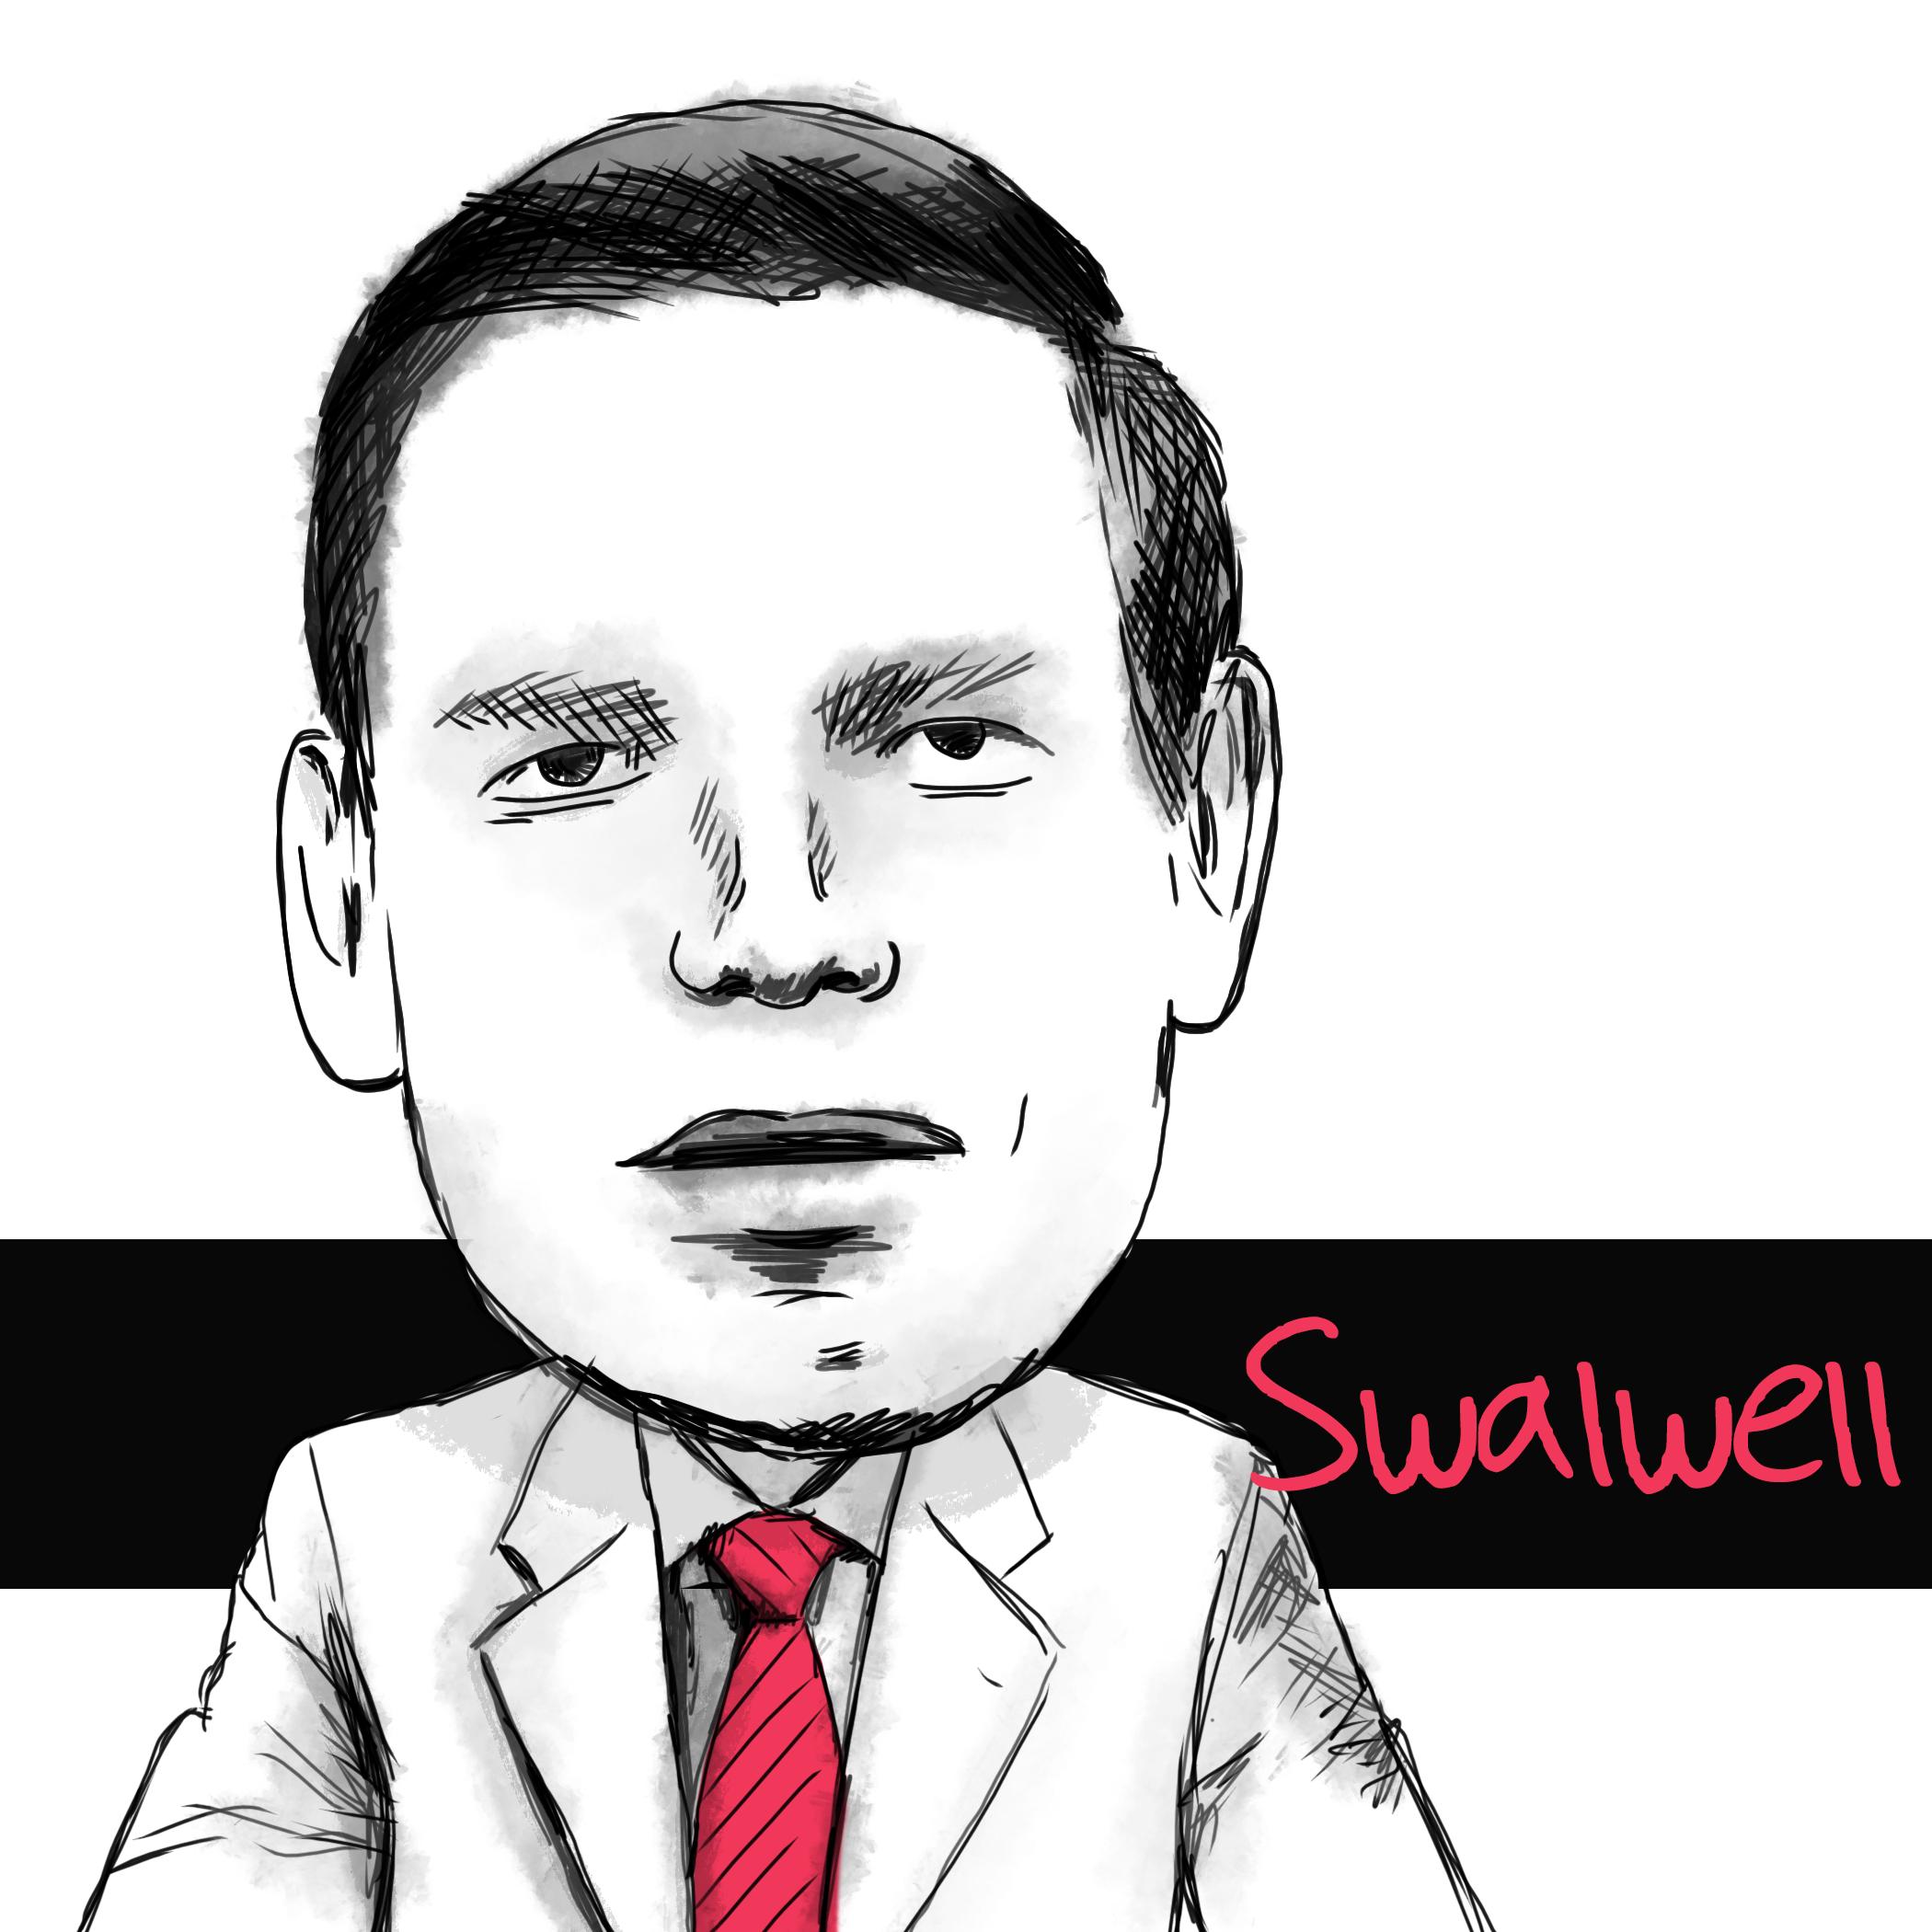 Eric Swalwell - Eric Swalwell For President - https://ericswalwell.com